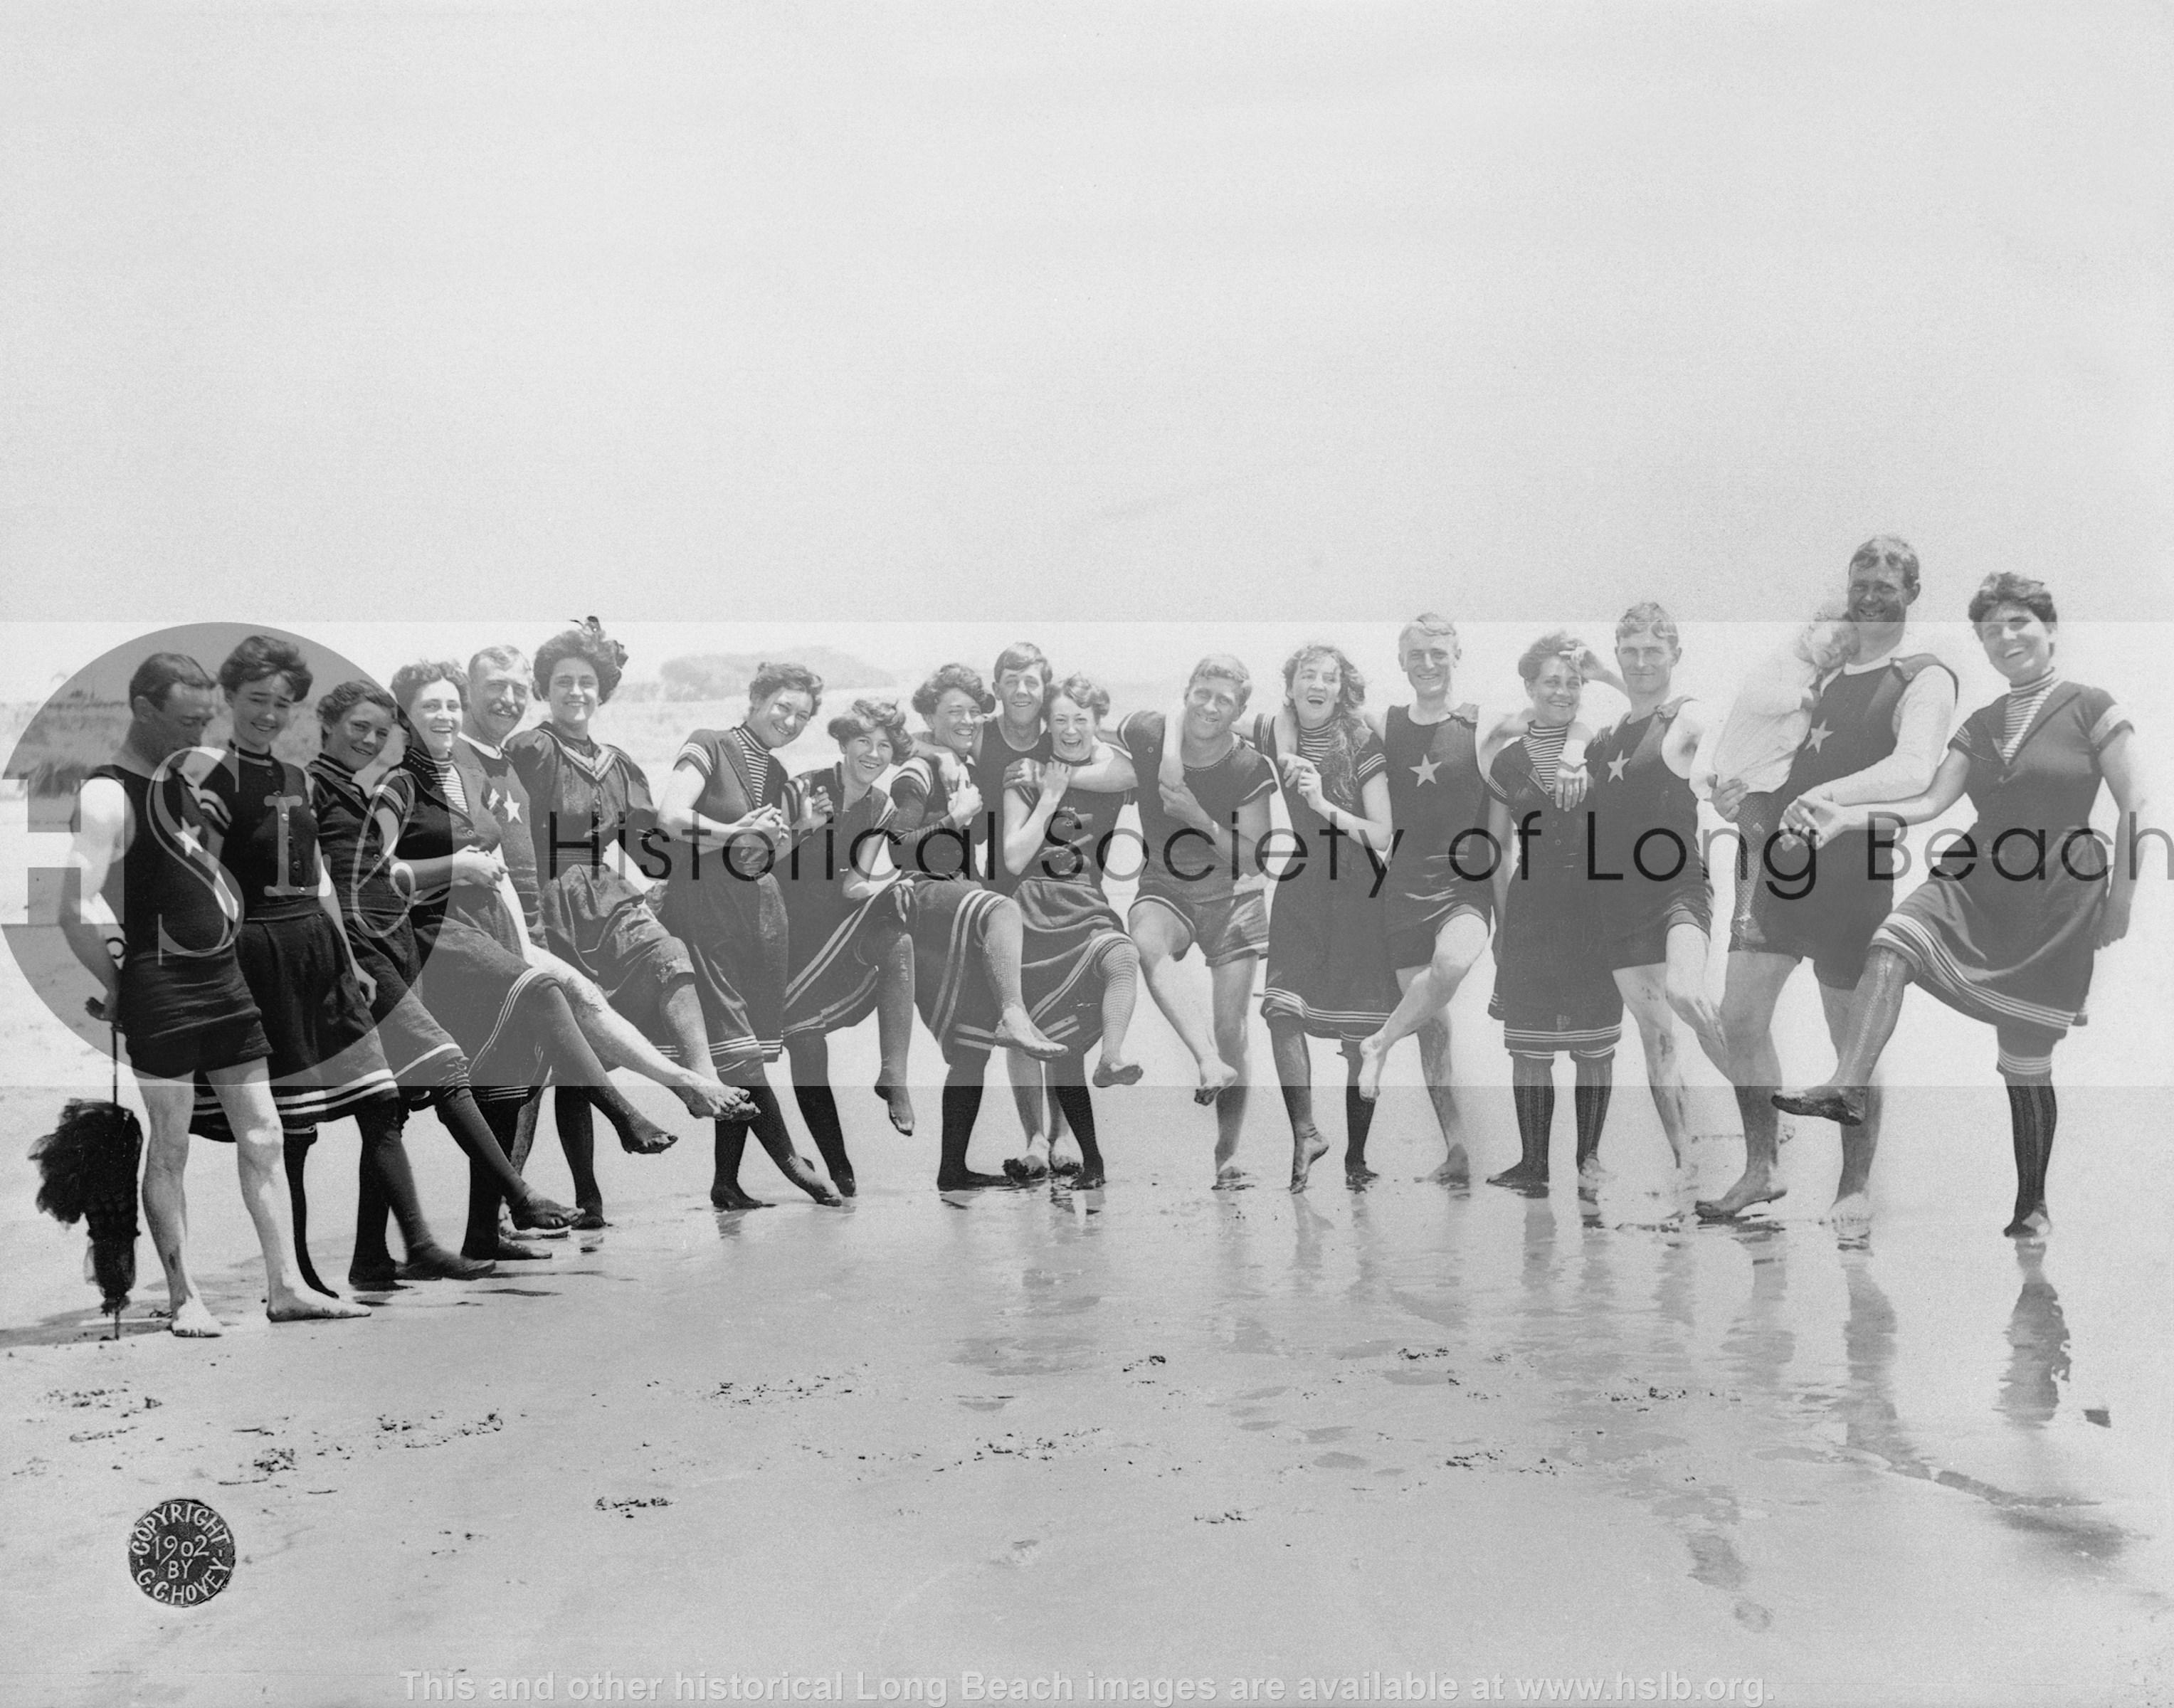 Bathers on beach, 1902